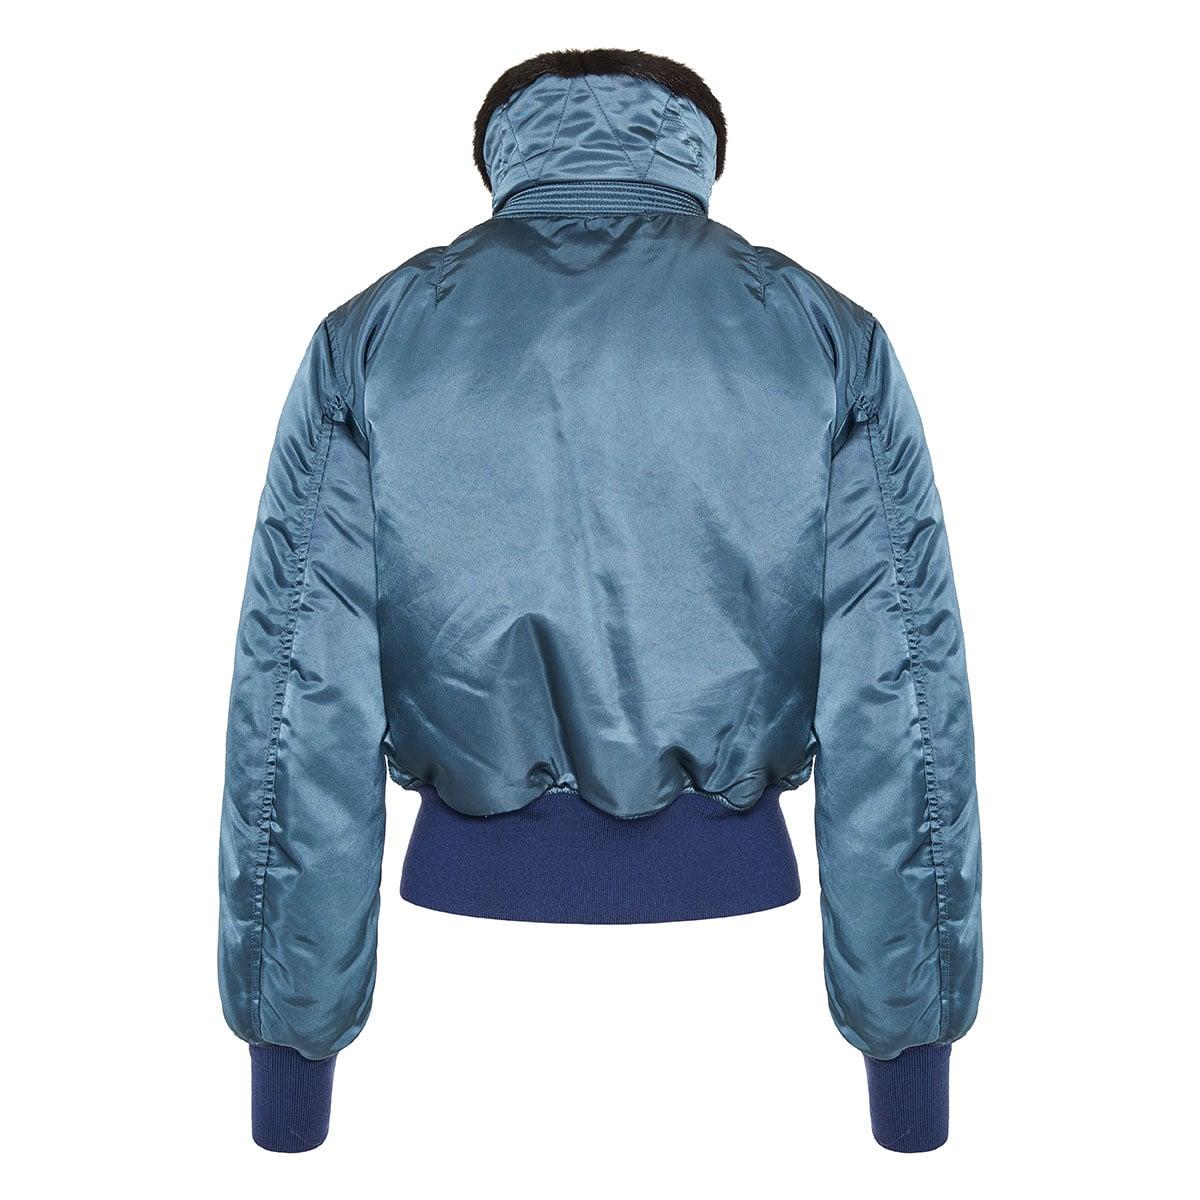 Fur-collar satin bomber jacket